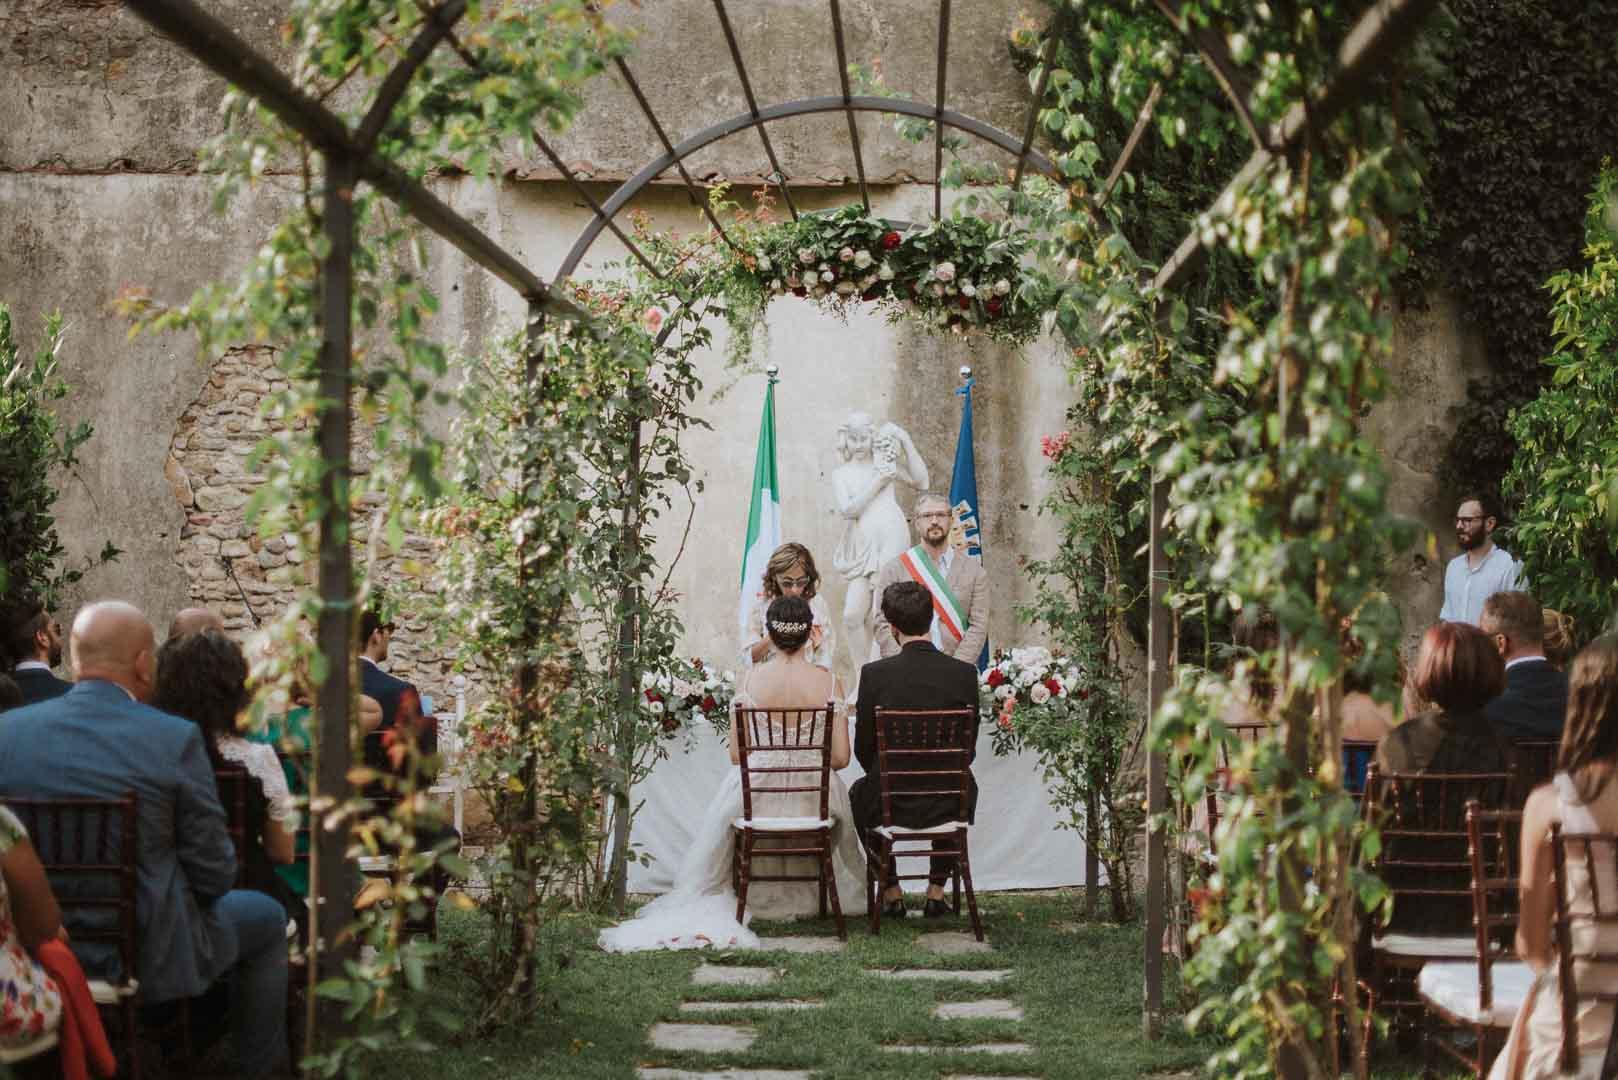 wedding-photographer-destination-fineart-bespoke-reportage-tuscany-villascorzi-vivianeizzo-spazio46-76